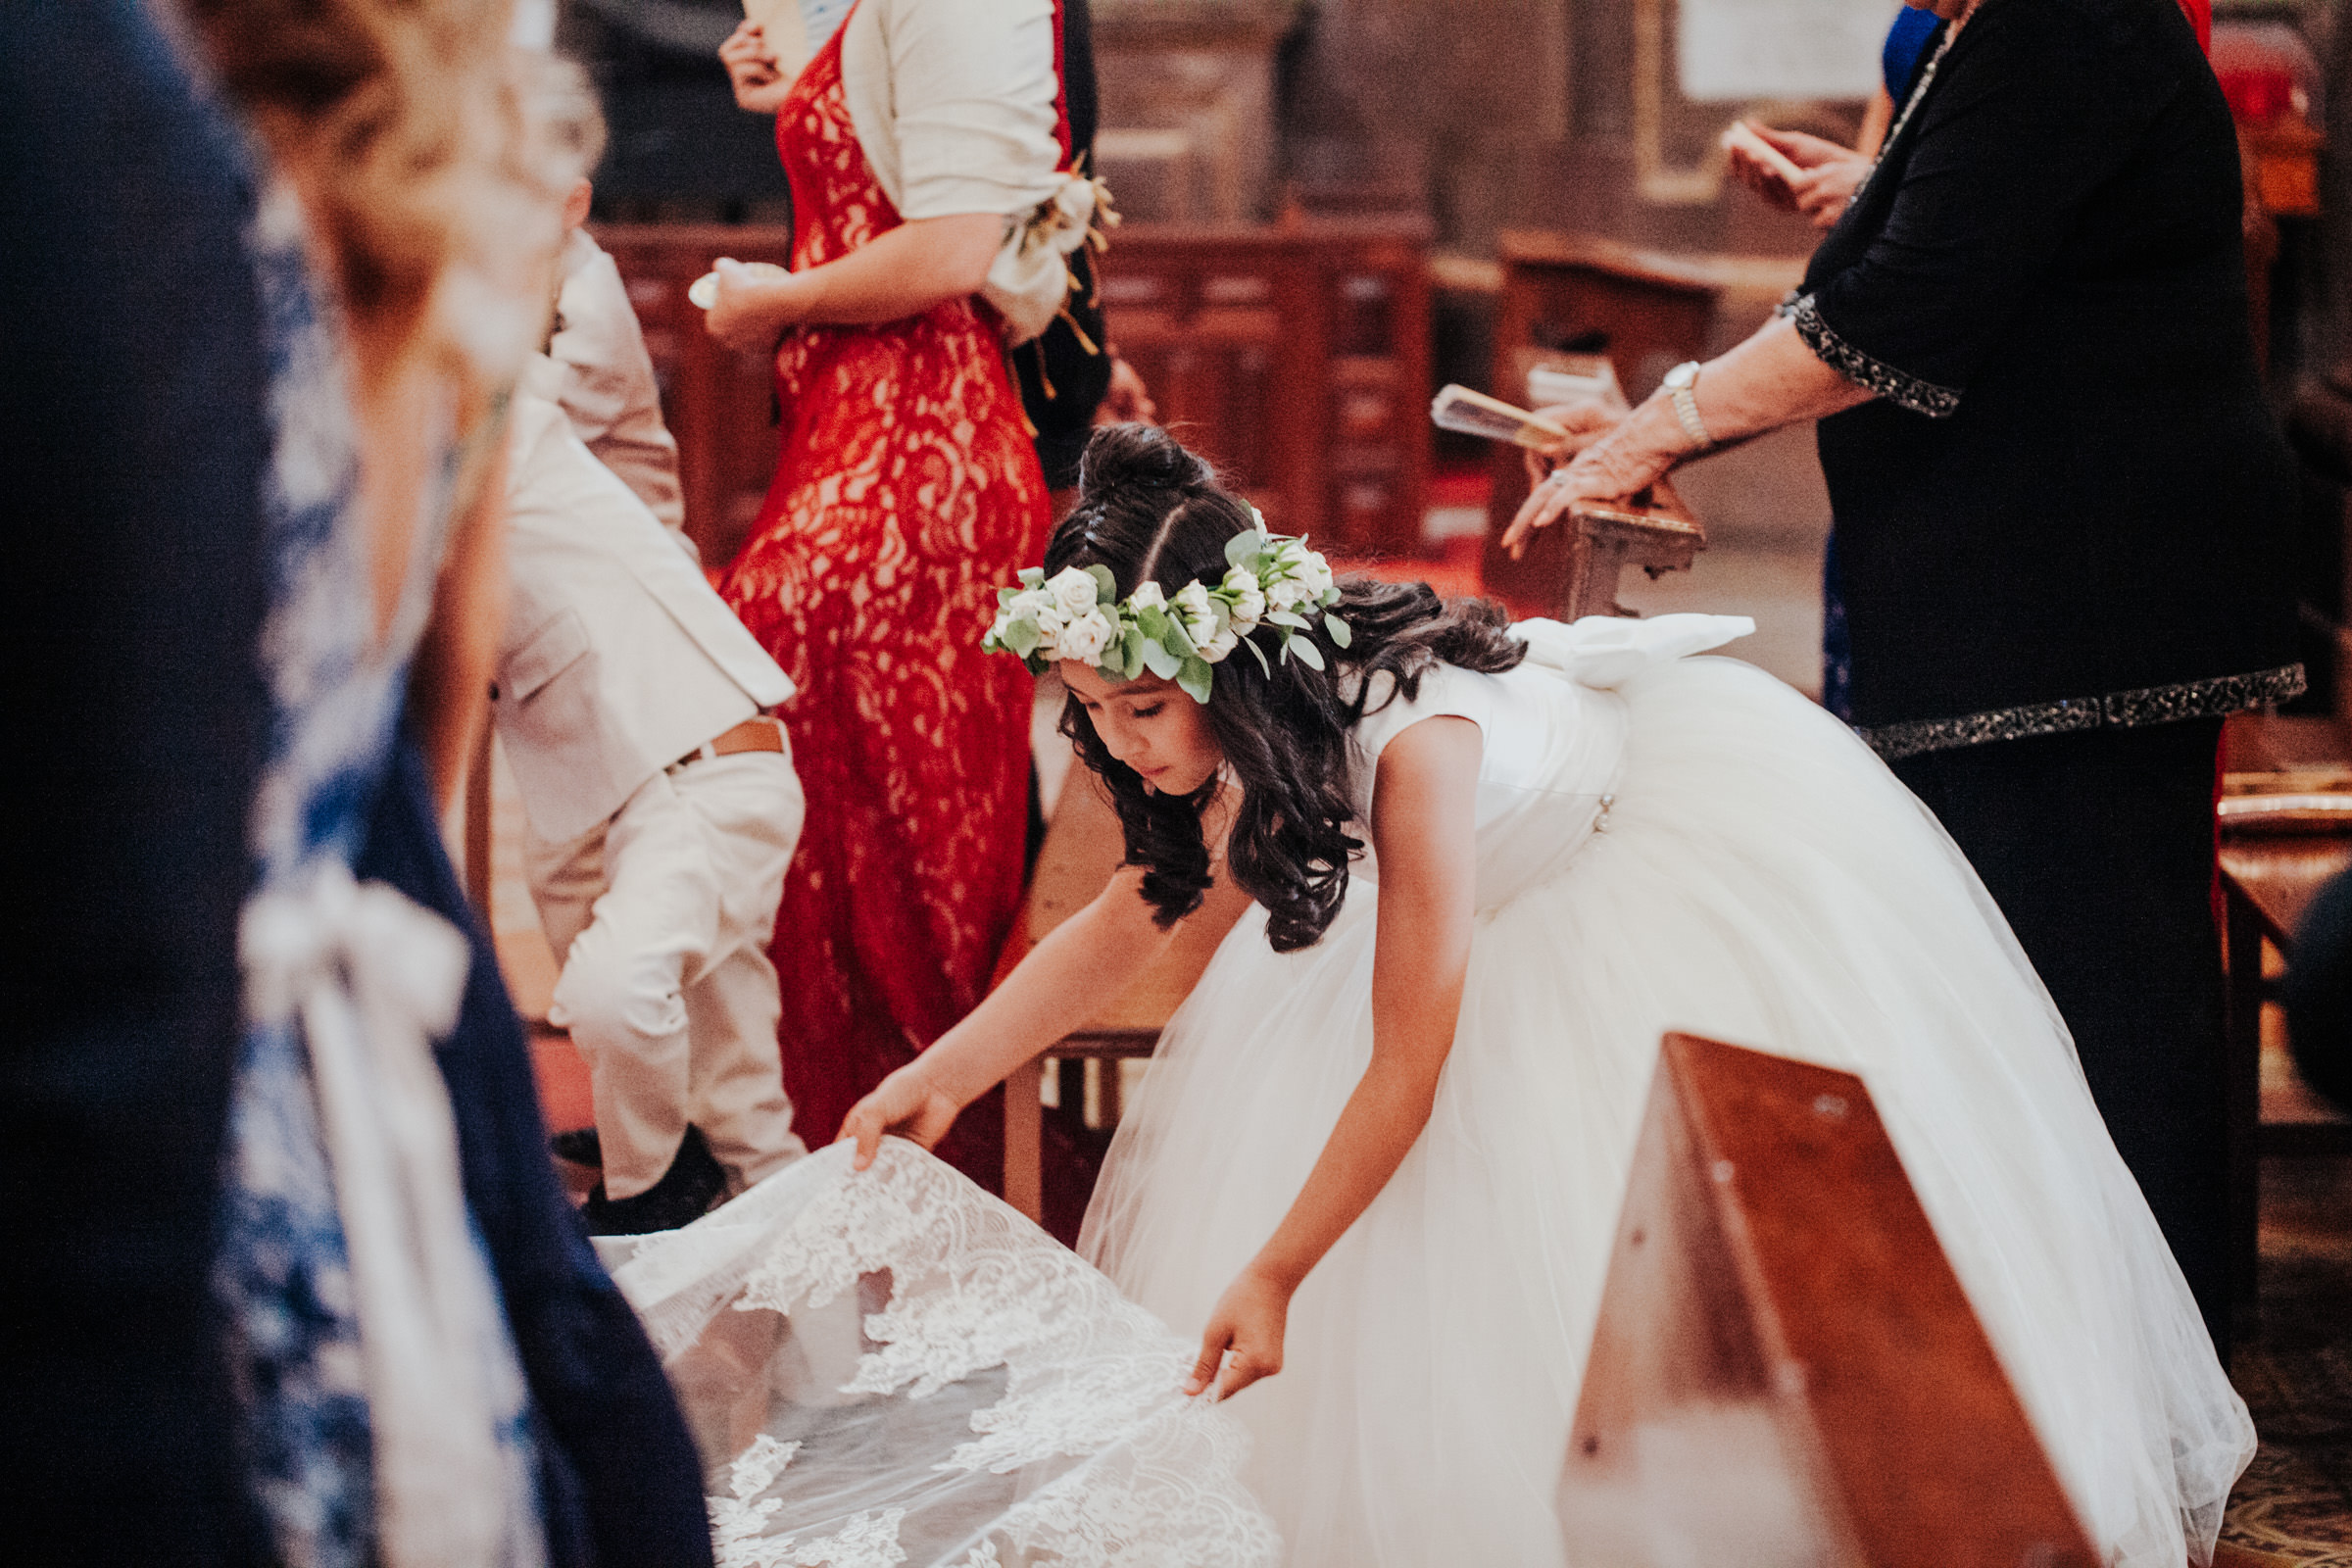 San-Miguel-de-Allende-Wedding-Photography-Parroquia-Instituto-Boda-Fotografia-Fer-Sergio-Pierce-Lifestyle-Photography0266.JPG